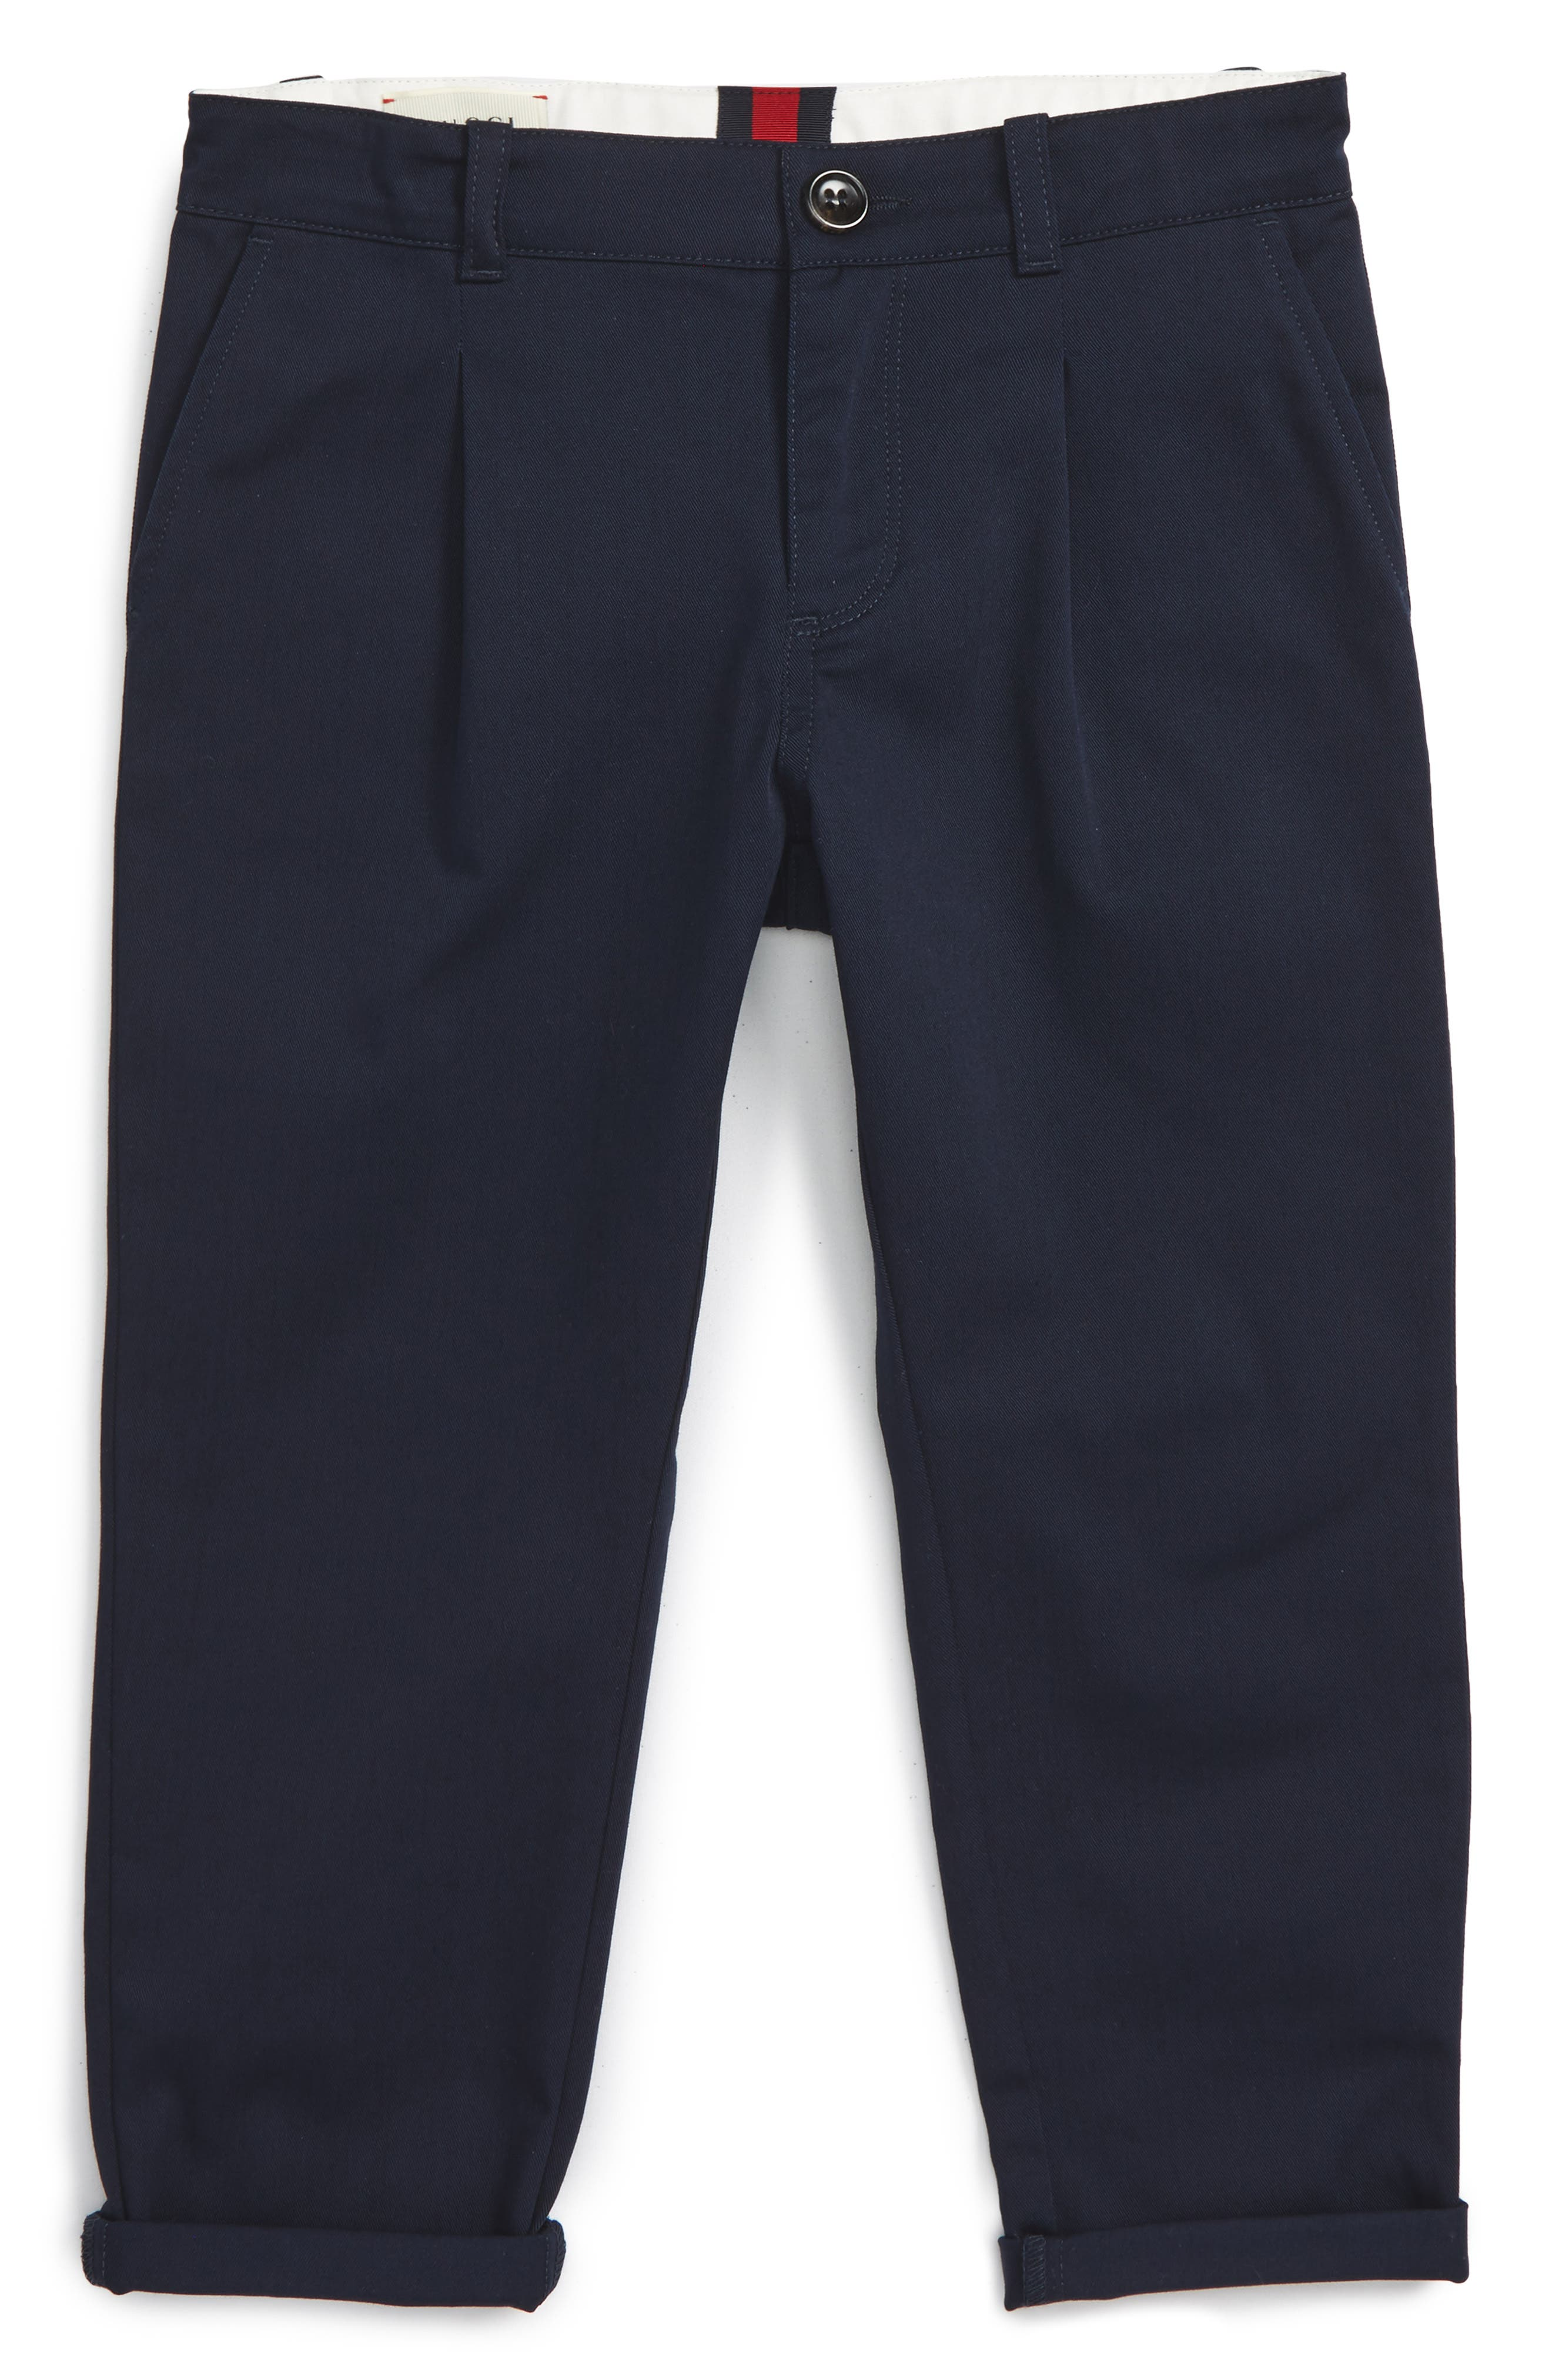 Alternate Image 1 Selected - Gucci Chino Pants (Little Boys & Big Boys)